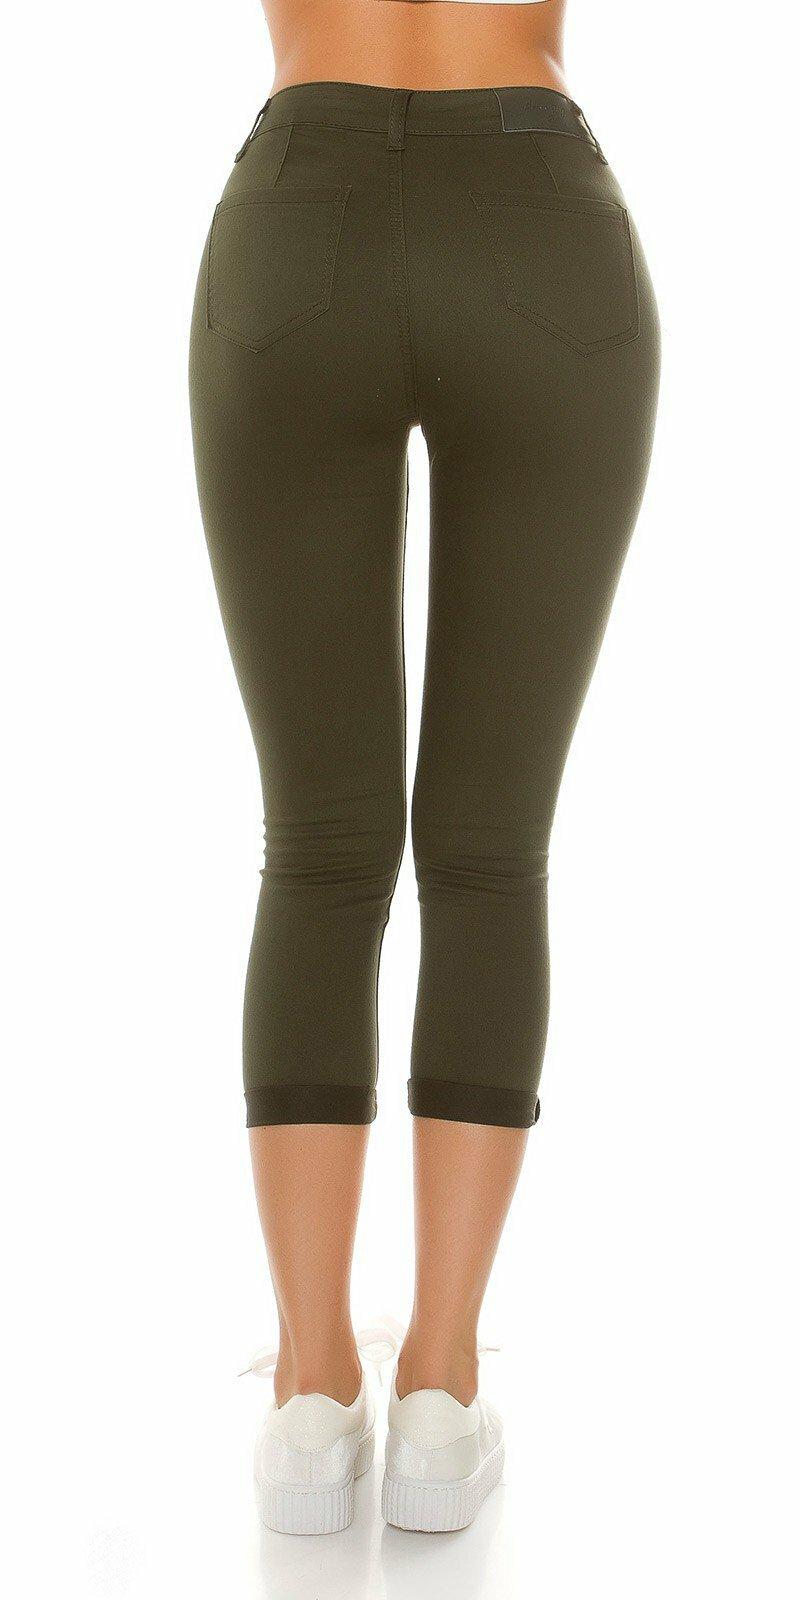 9c3471b14e13 ... Dámske džínsy s vysokým pásom a rozparkami na kolenách Khaki ...